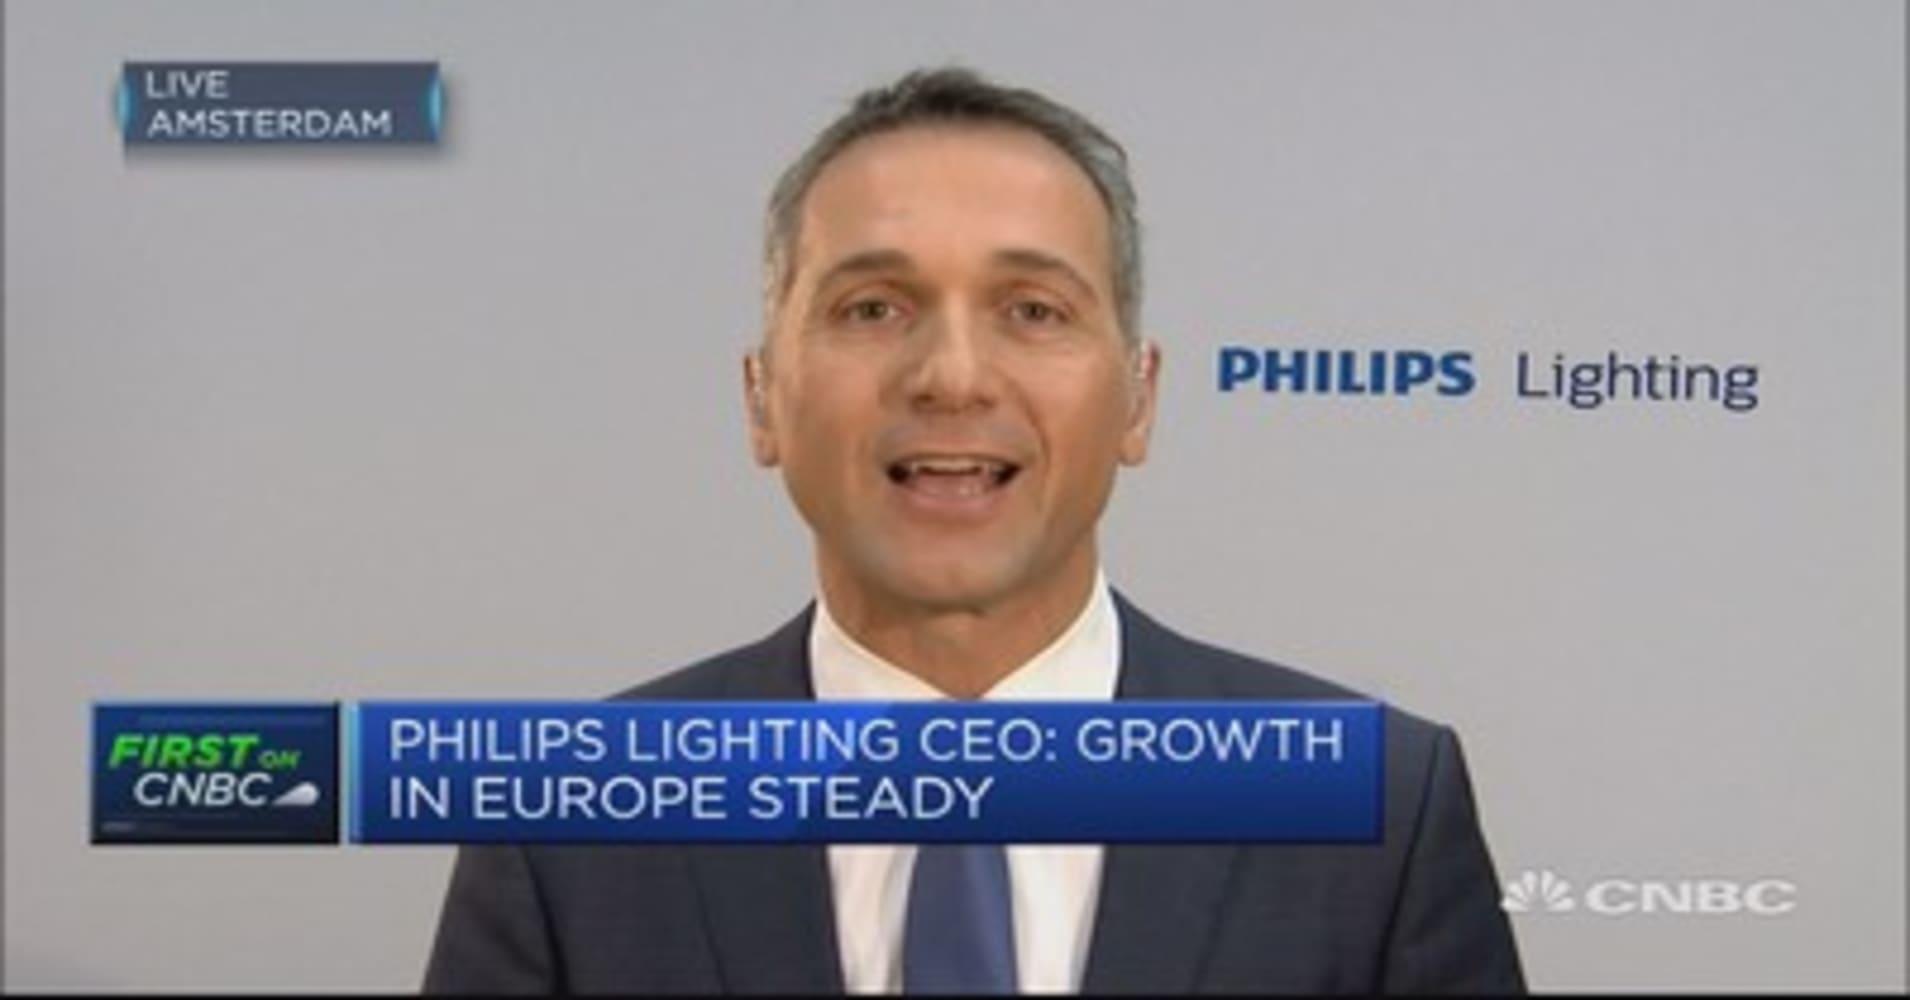 Philips lighting earnings ahead on better led home lighting margins philips lighting ceo growth in europe steady buycottarizona